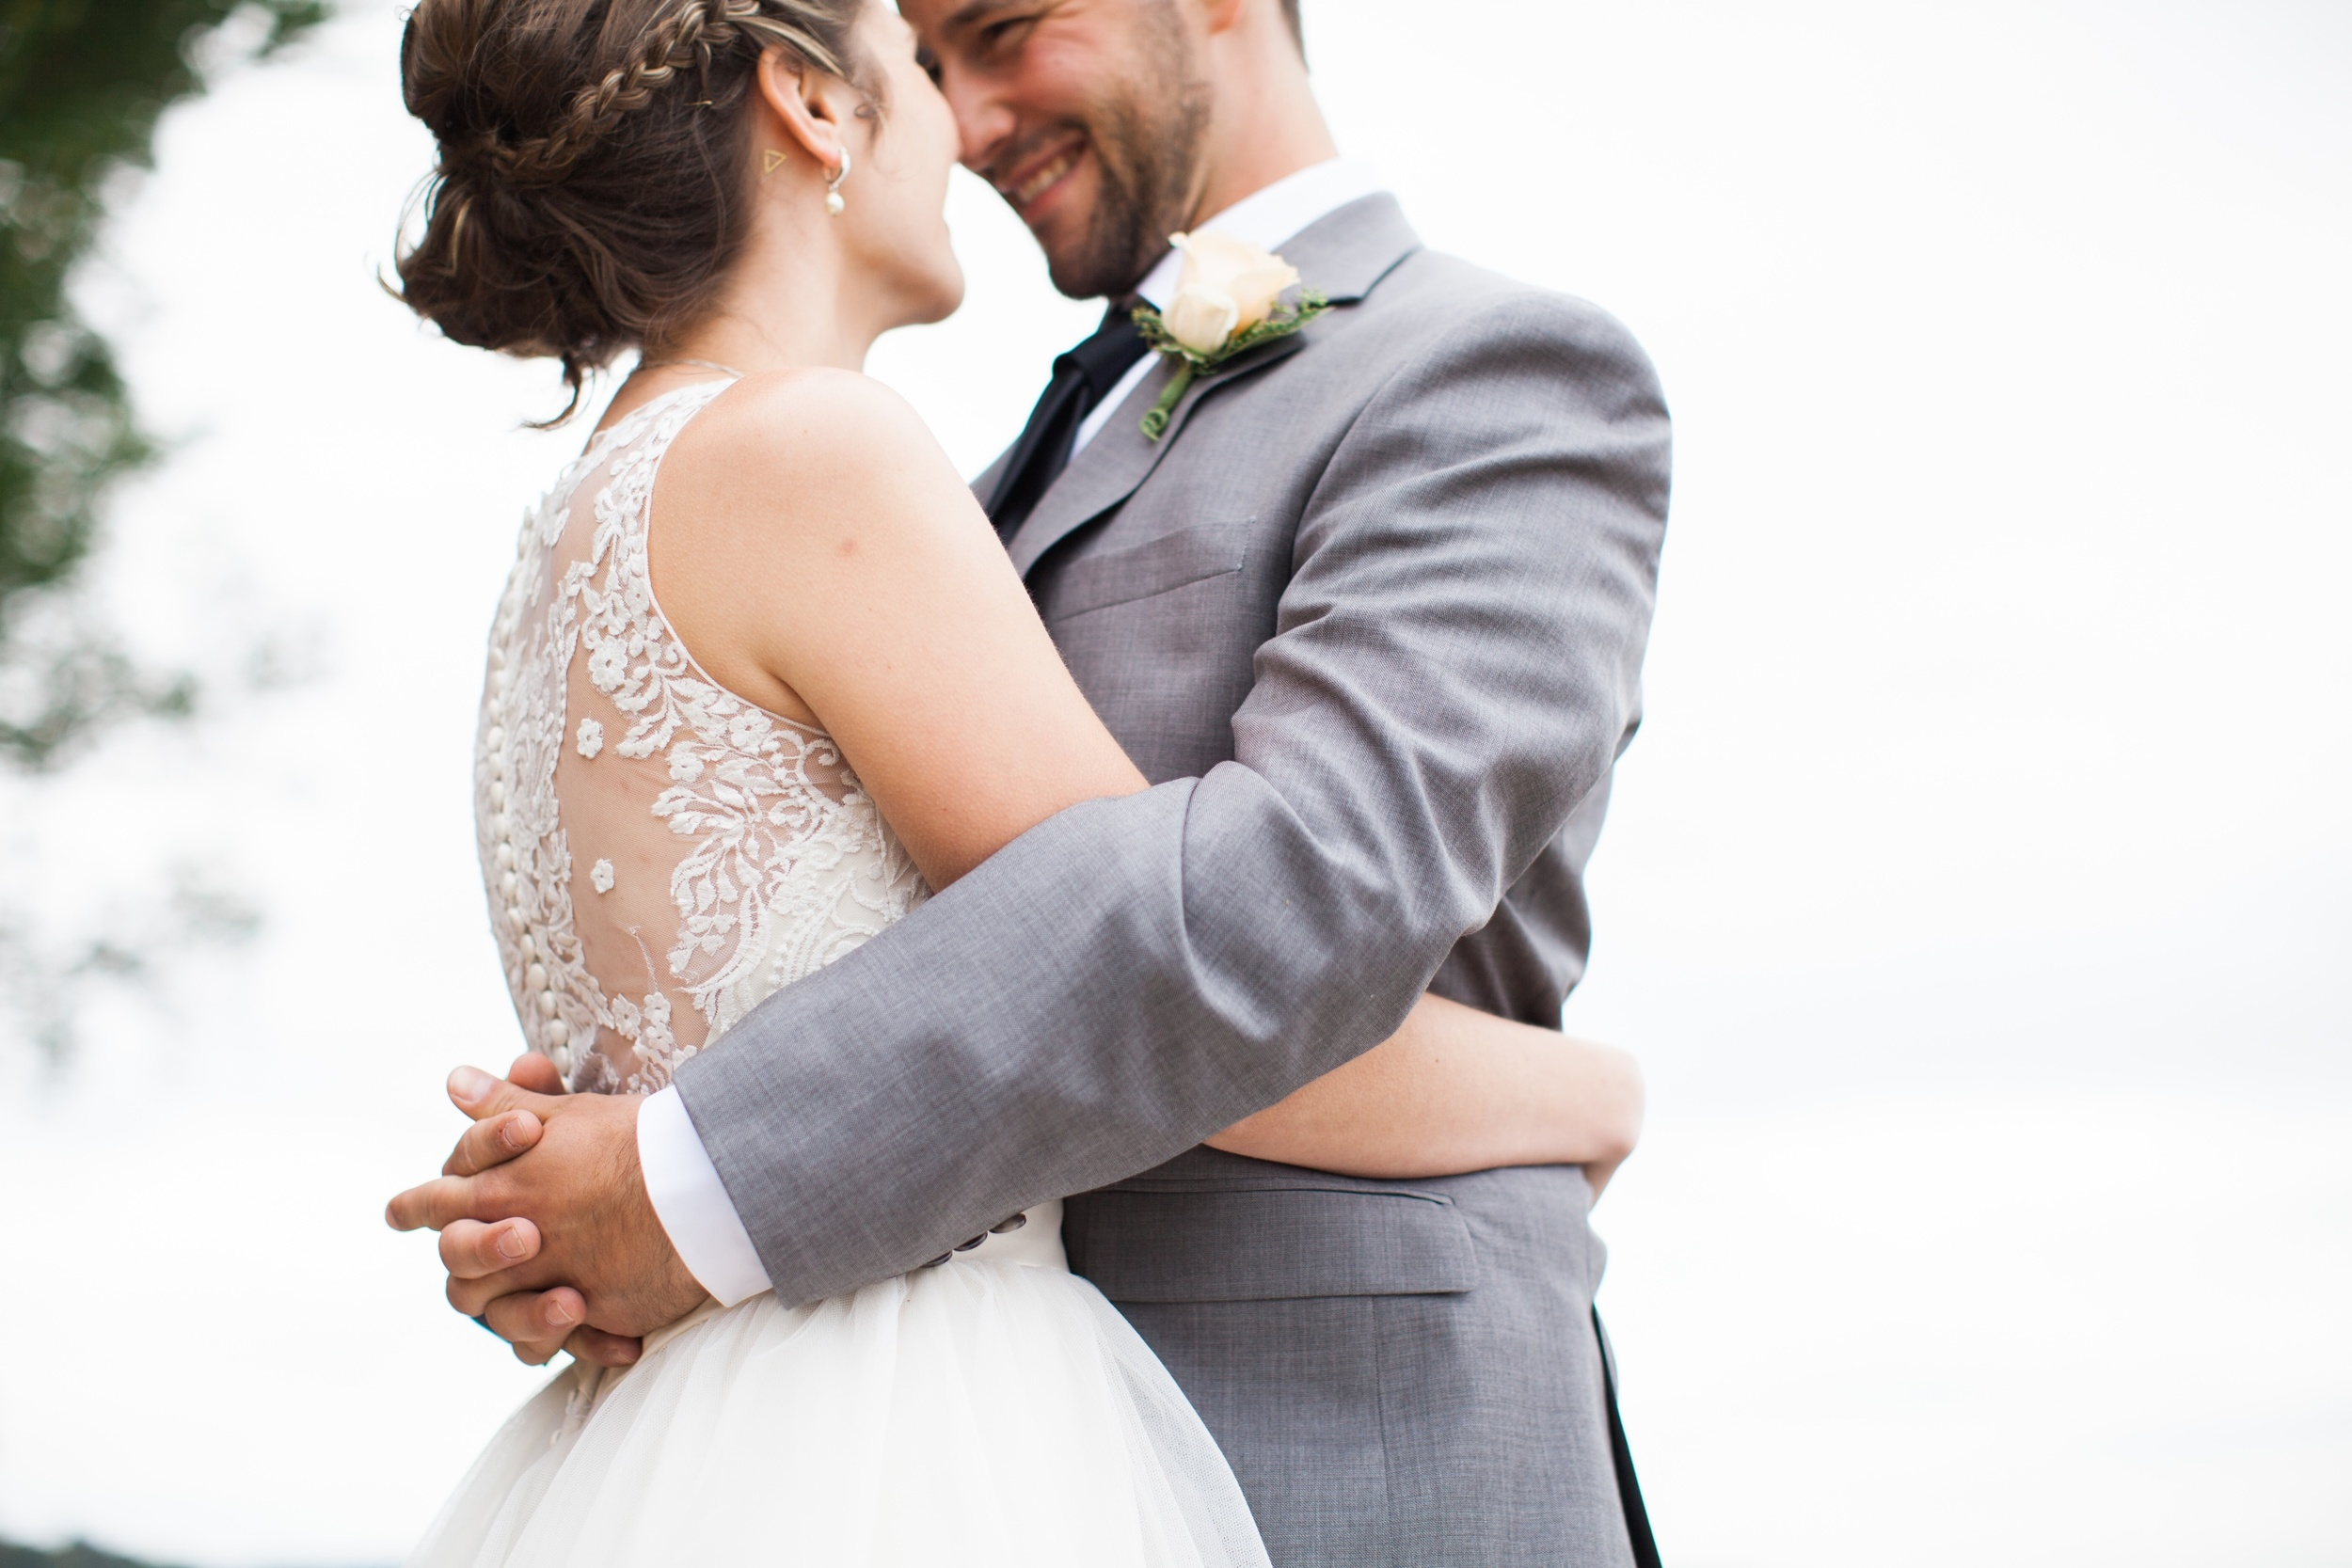 seattle wedding photographer film photography golden garden gardens state park ocean sand bride groom 7.jpg